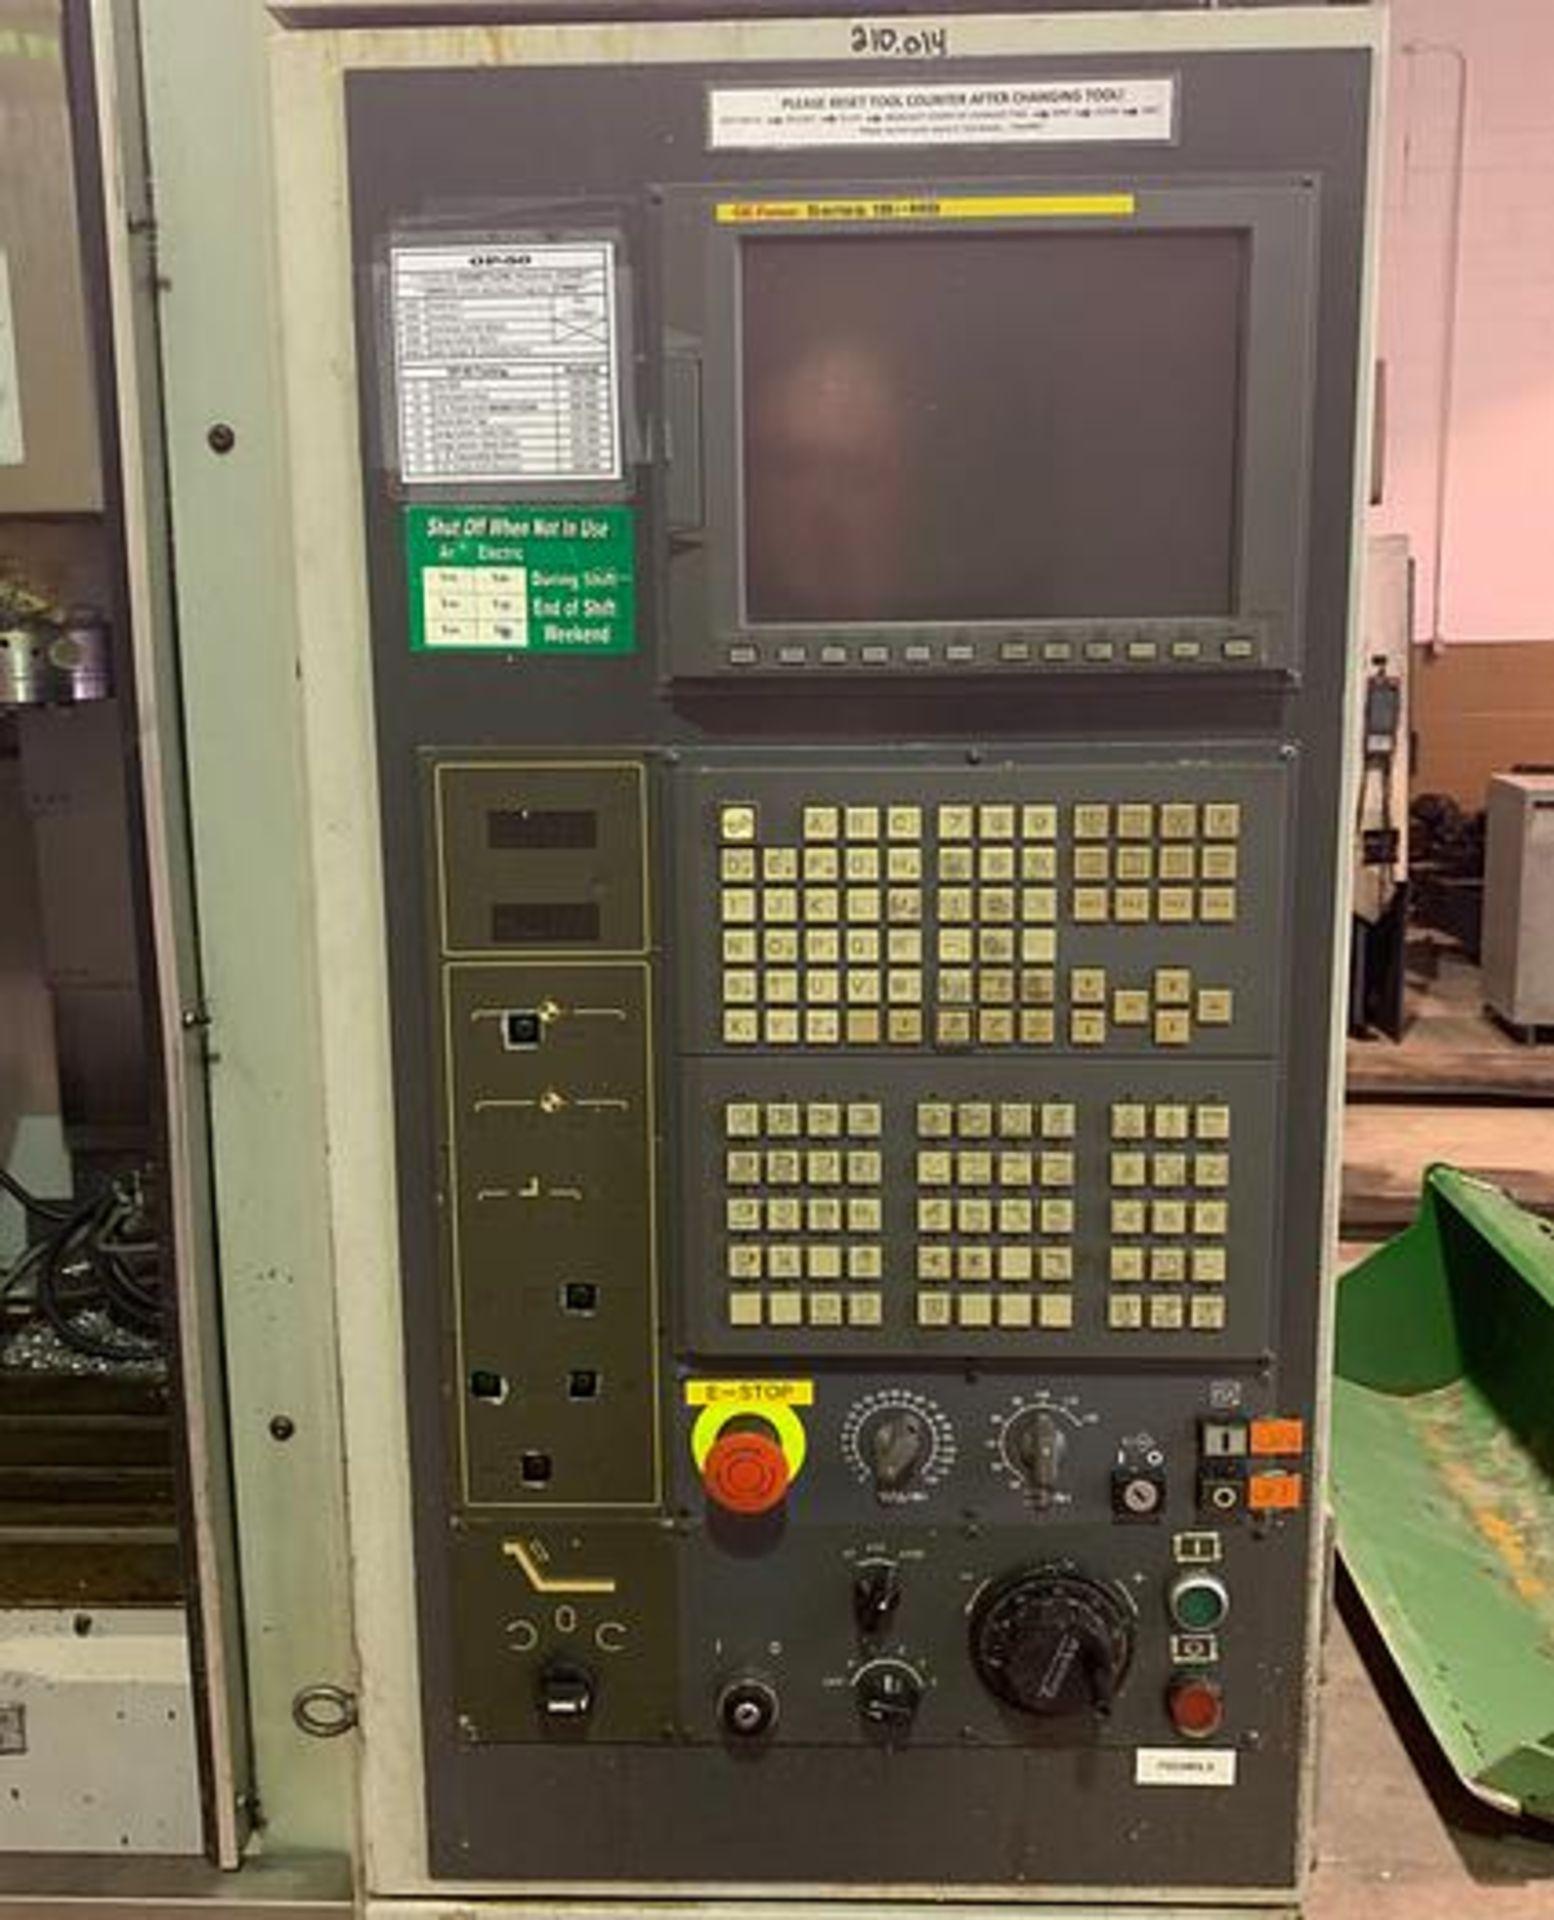 "HARDINGE XR760 CNC VMC PRODUCTION CENTER 30""X24""X24"", YEAR 2010, SN XRAB0A0001 - Image 2 of 12"